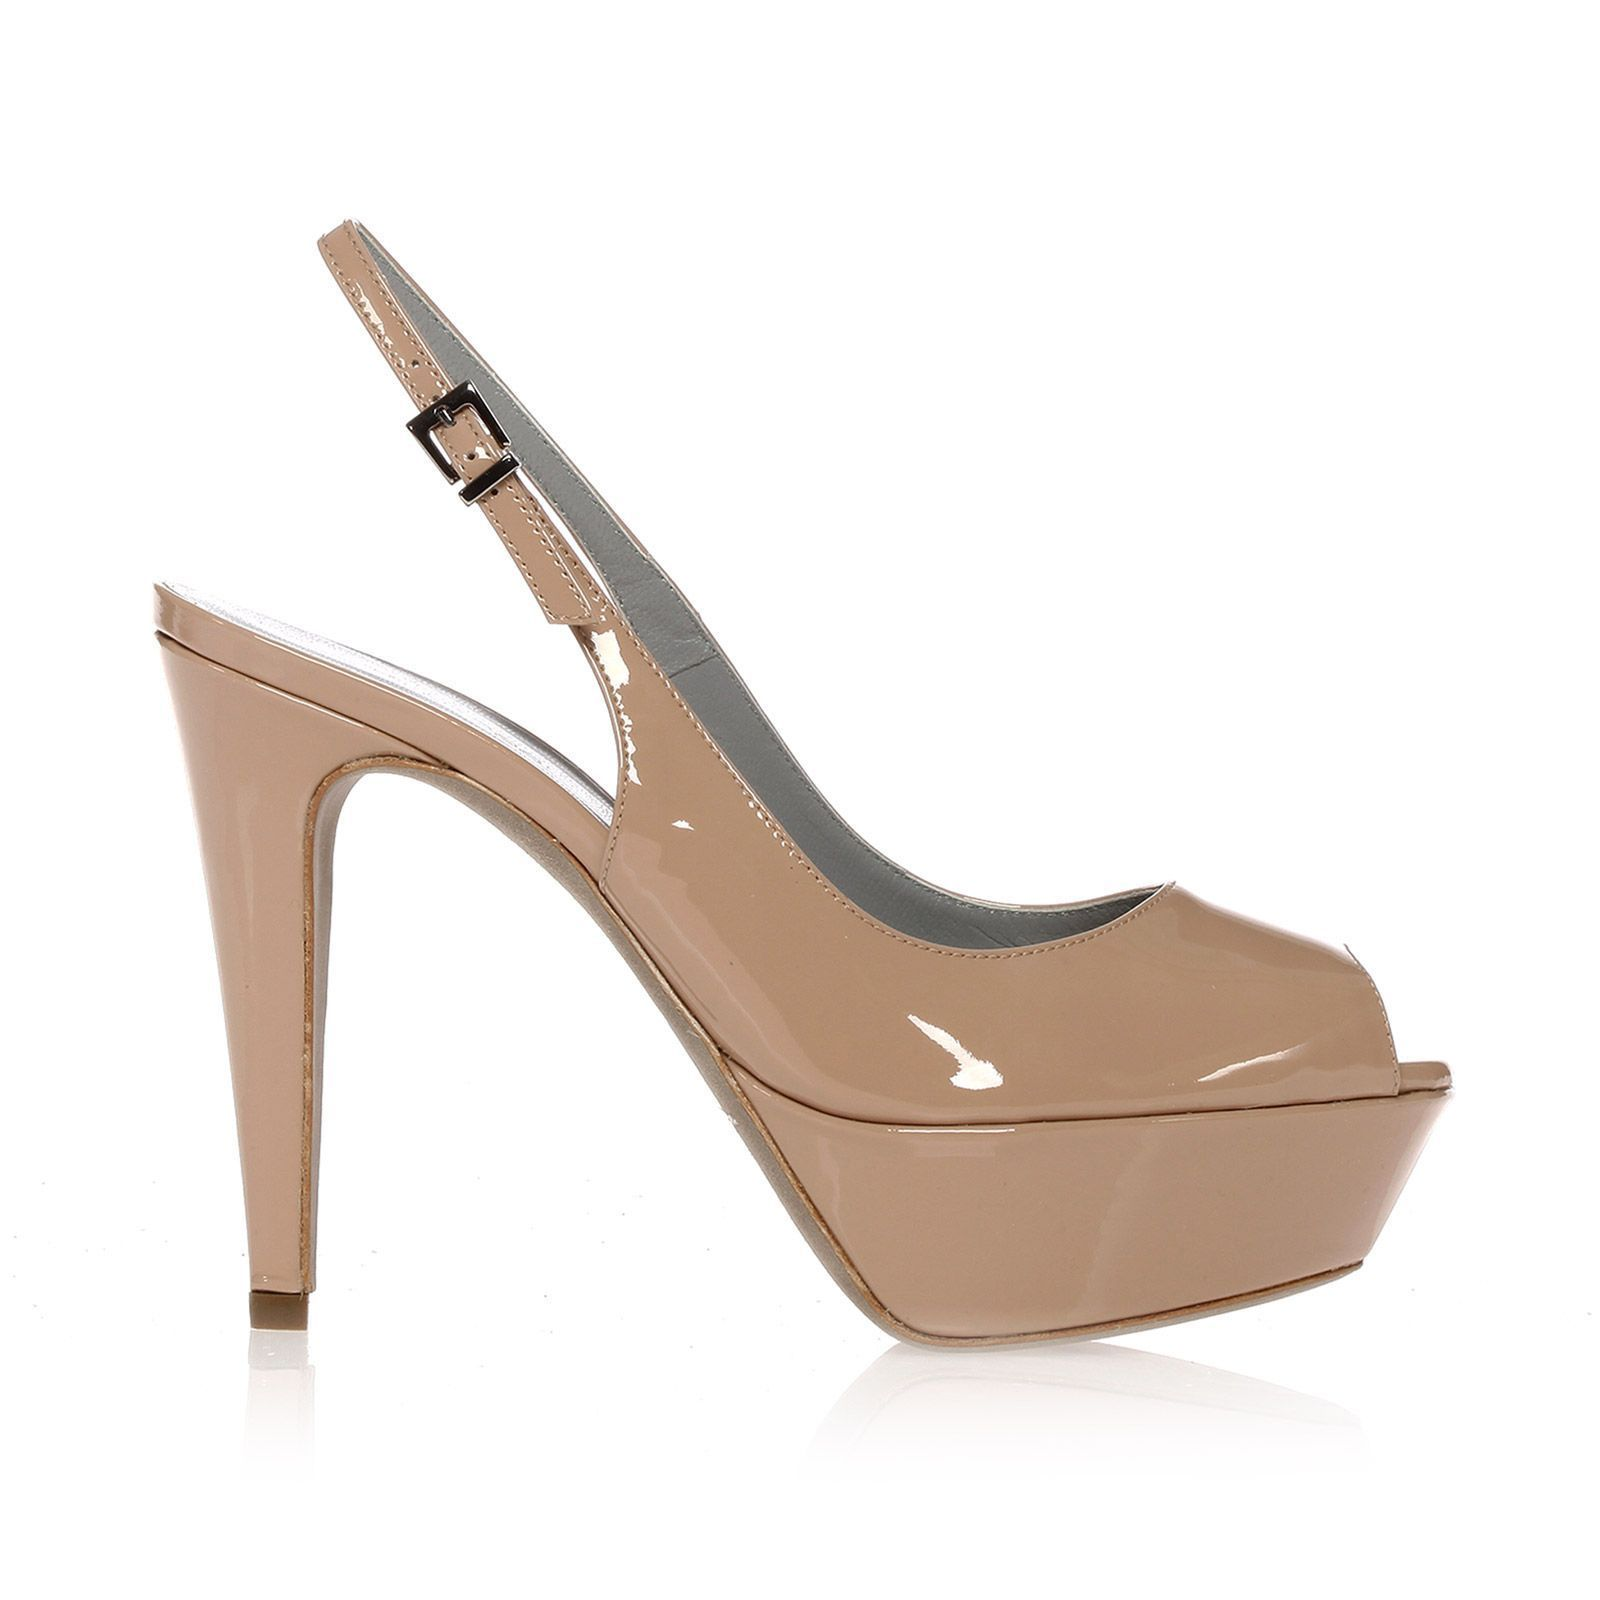 2e1c83e740efab Chaussures plateforme en cuir verni beige rosé - Sergio Rossi ...